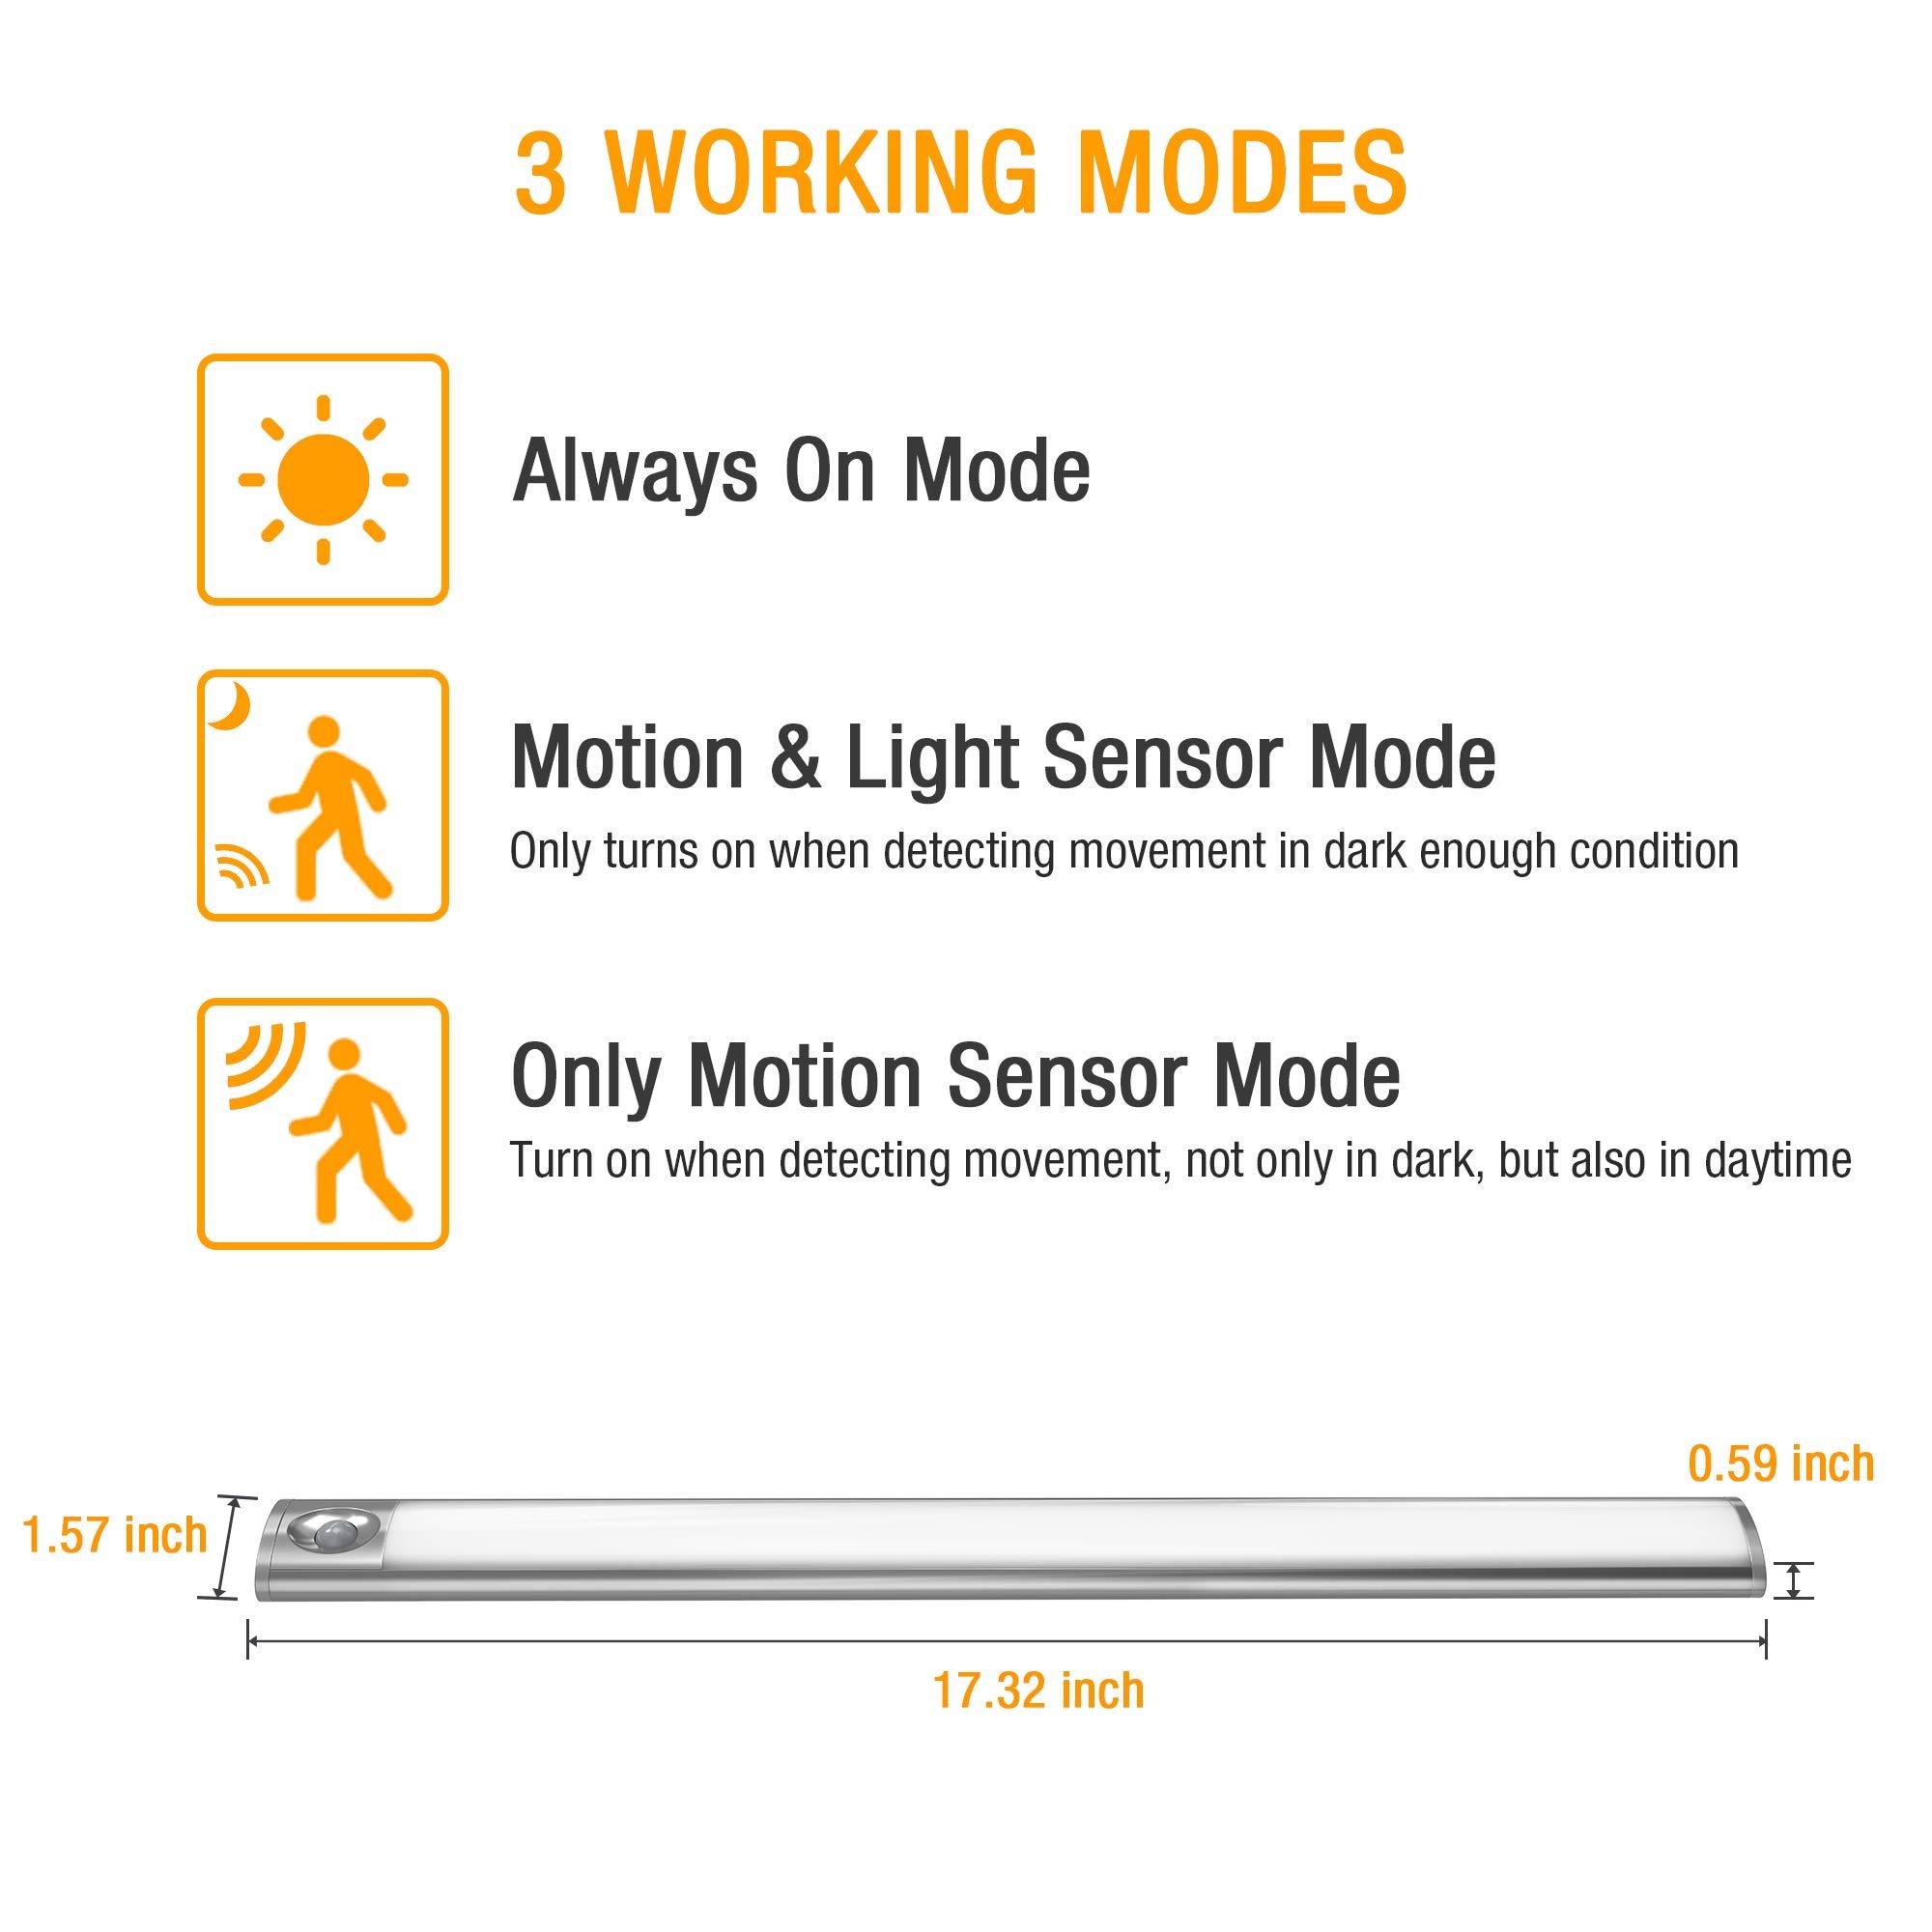 66 LED Under Cabinet Light, Rechargeable Motion Sensor Closet Light Wireless Luxury Aluminum Night Lighting for Kitchen Cabinet, Closet, Wardrobe, 2 Sensor Mode (Only Motion, Motion & Light) by LOFTER (Image #4)